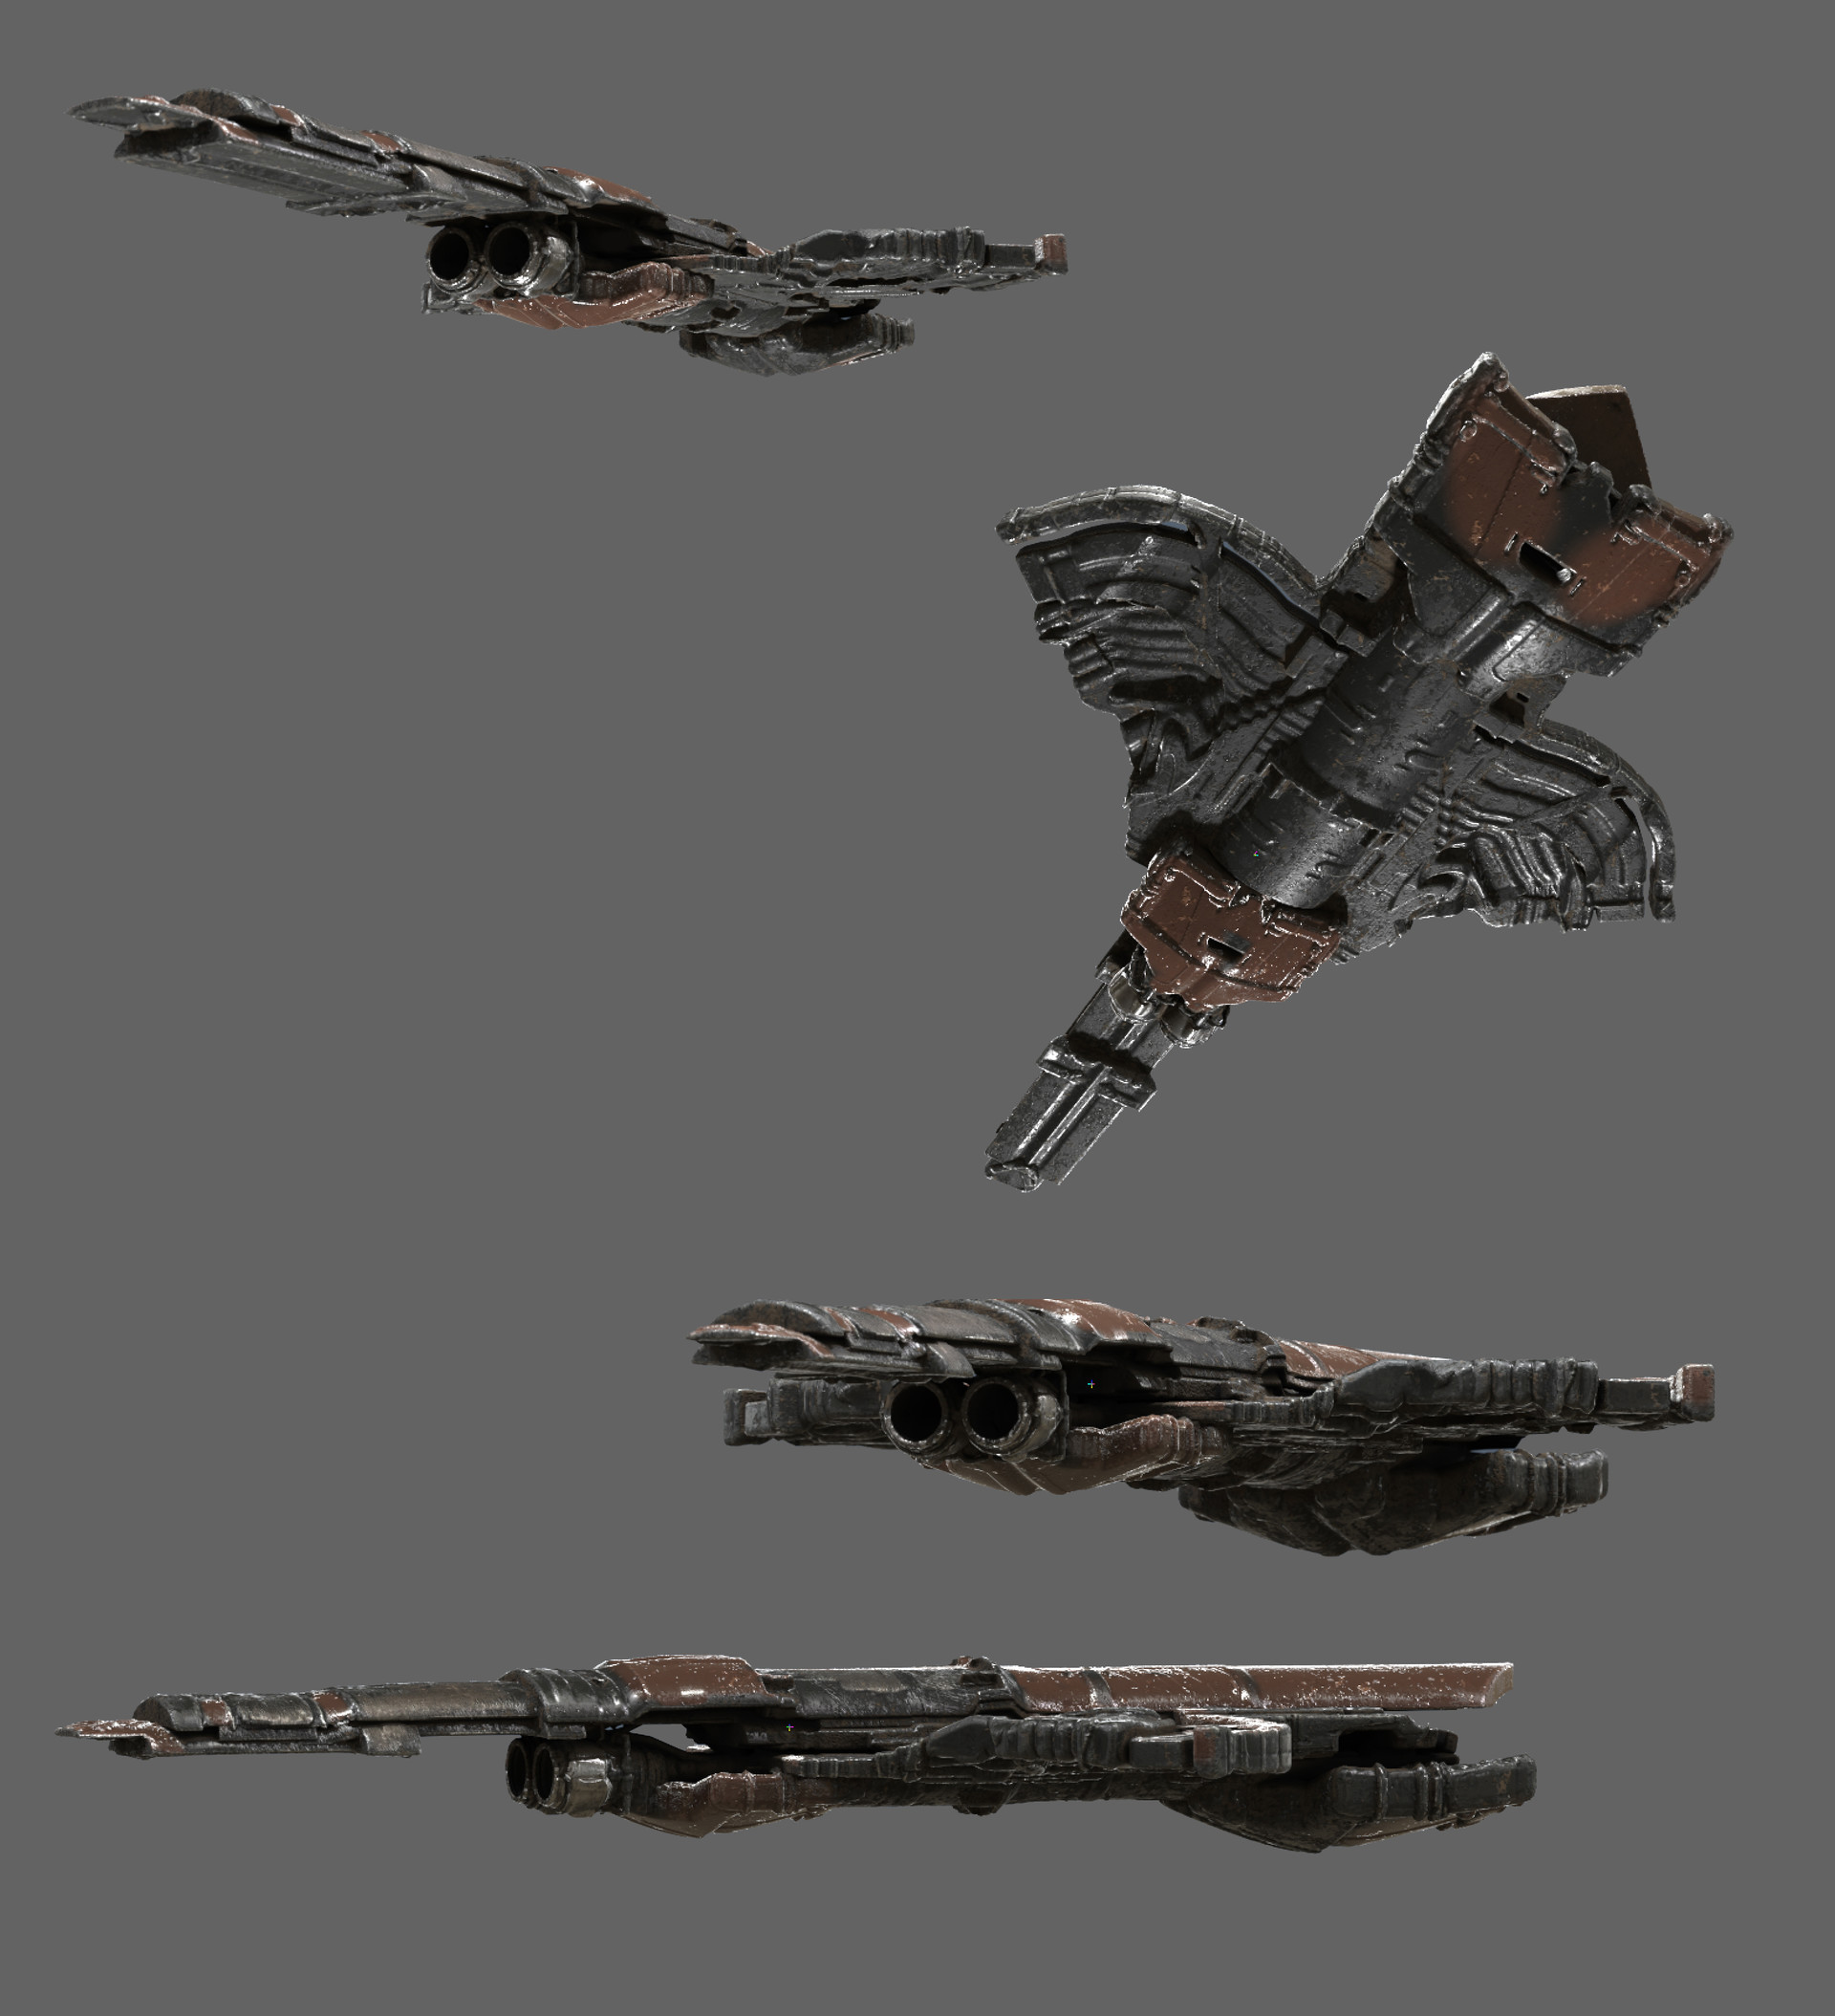 Devin korwin sapce ship texture